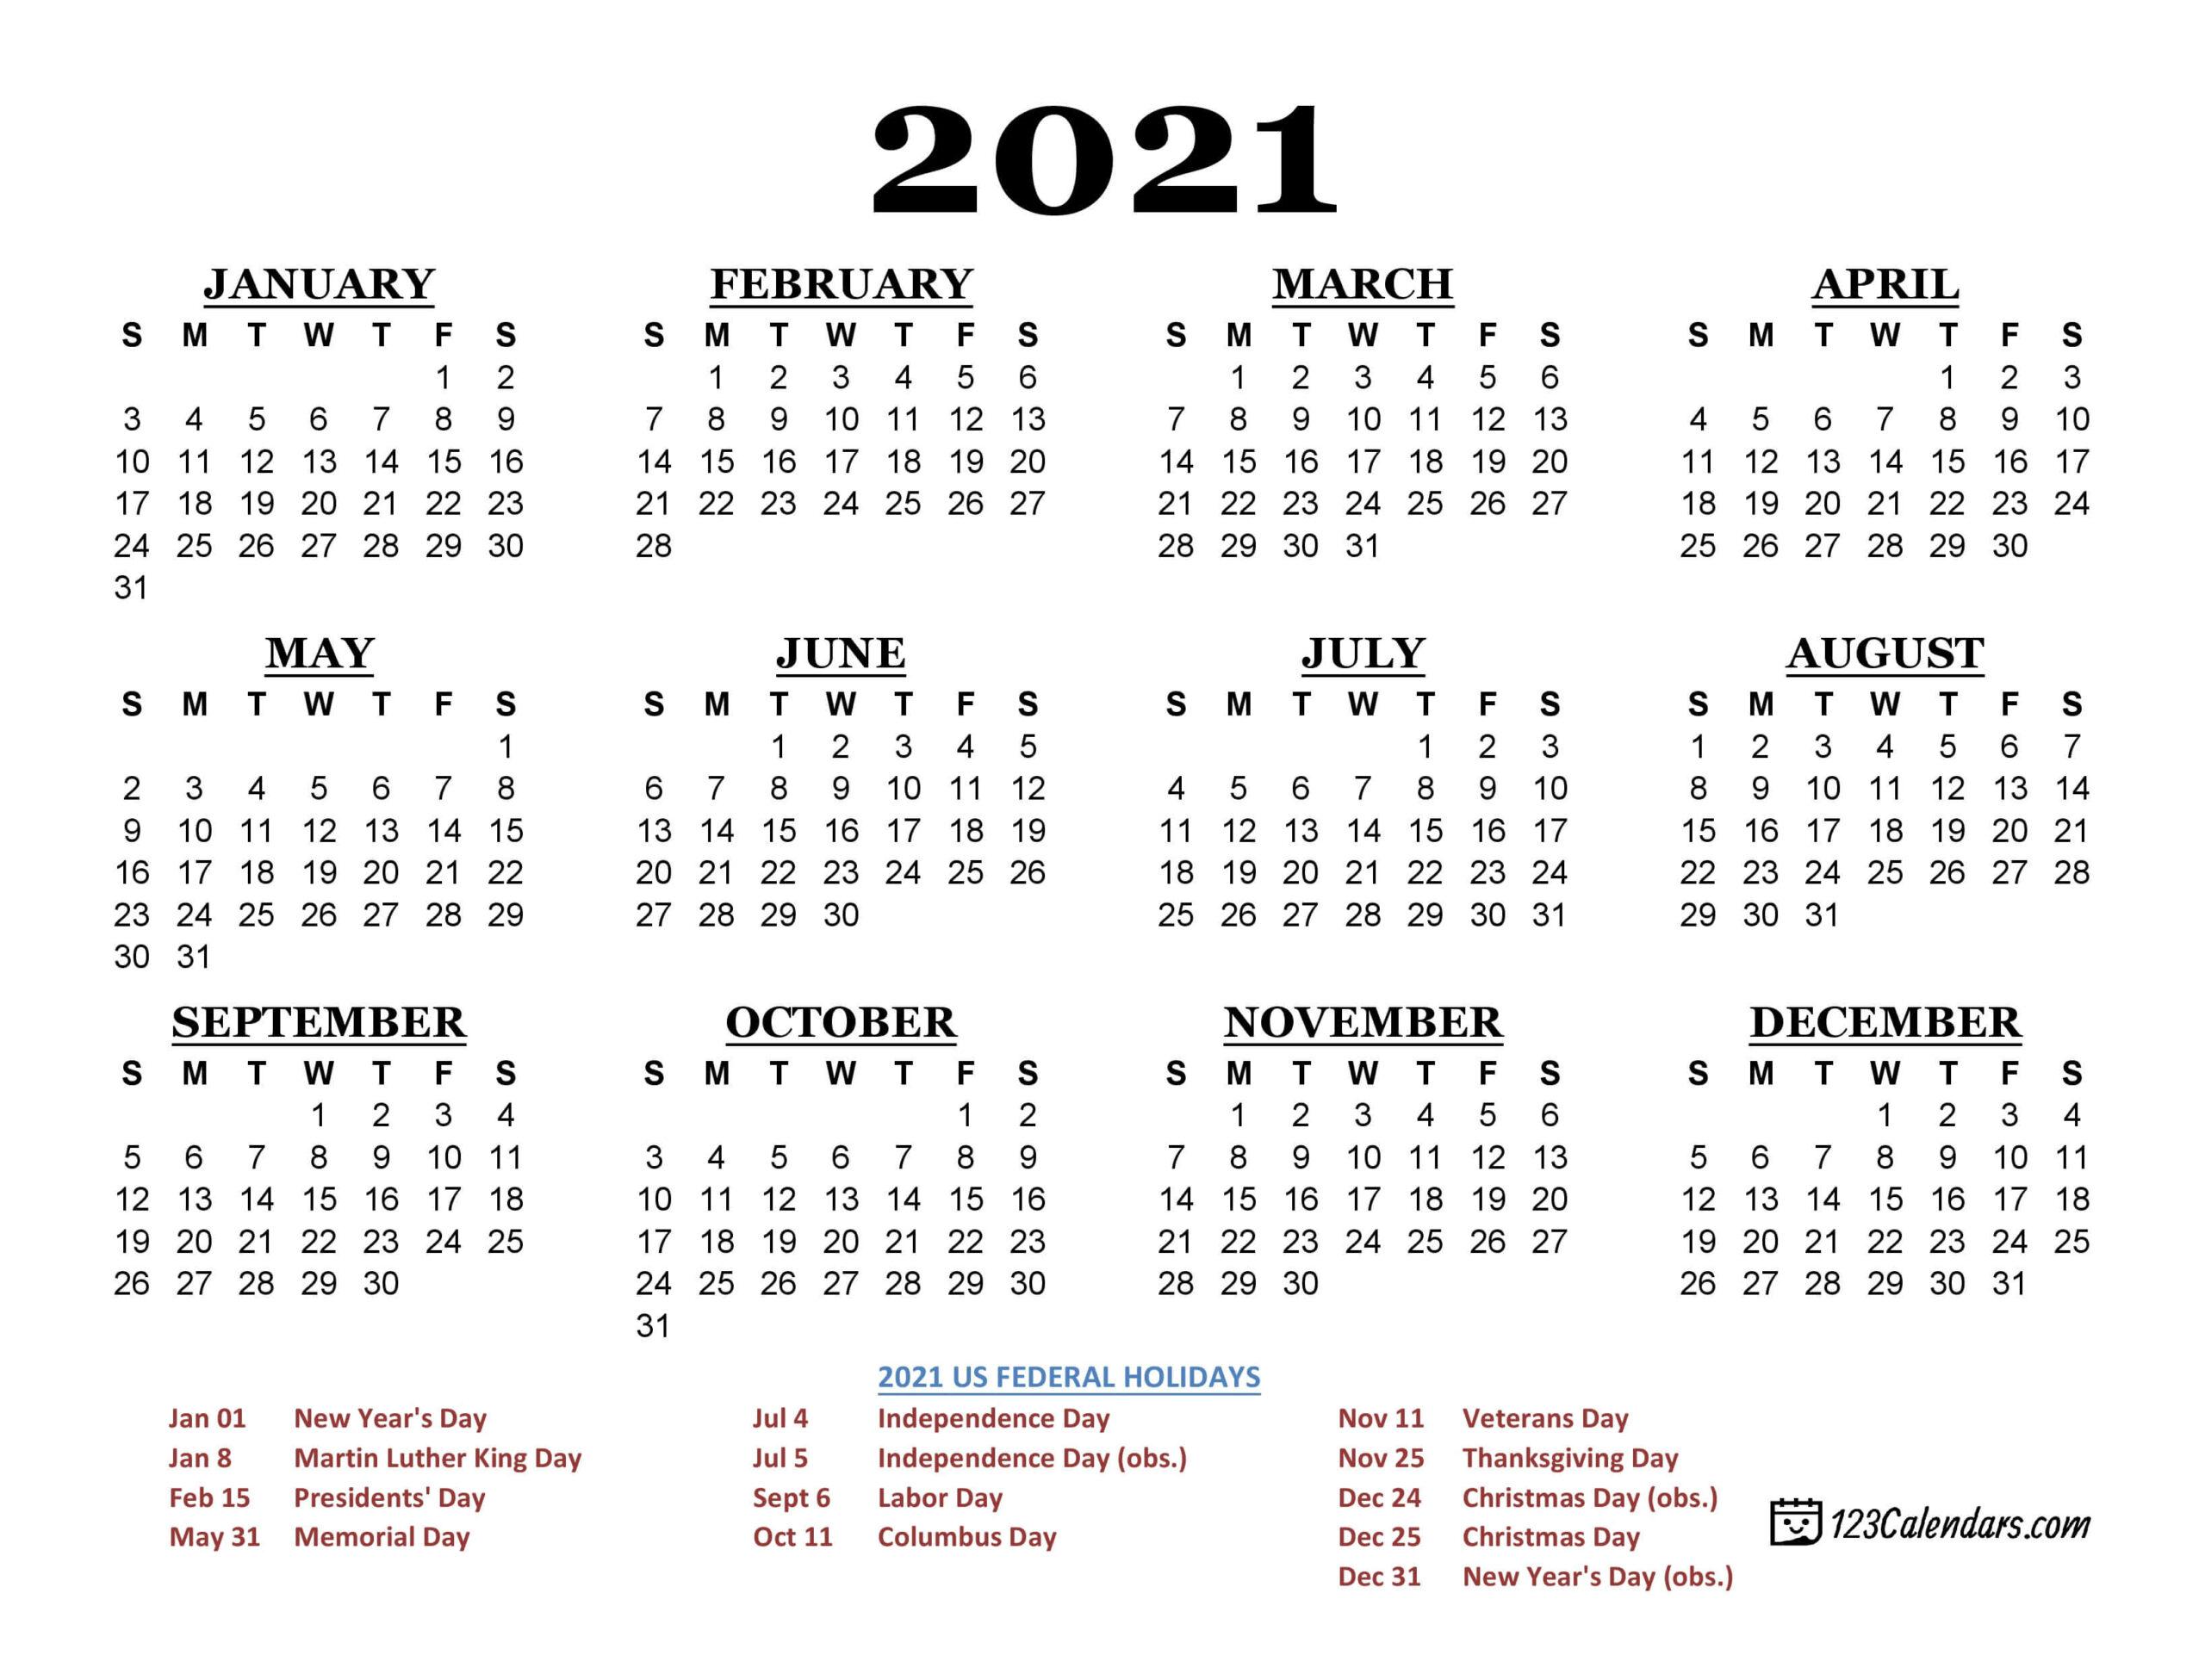 2021 Printable Calendar | 123Calendars with Pocket Calendar Printable 2021